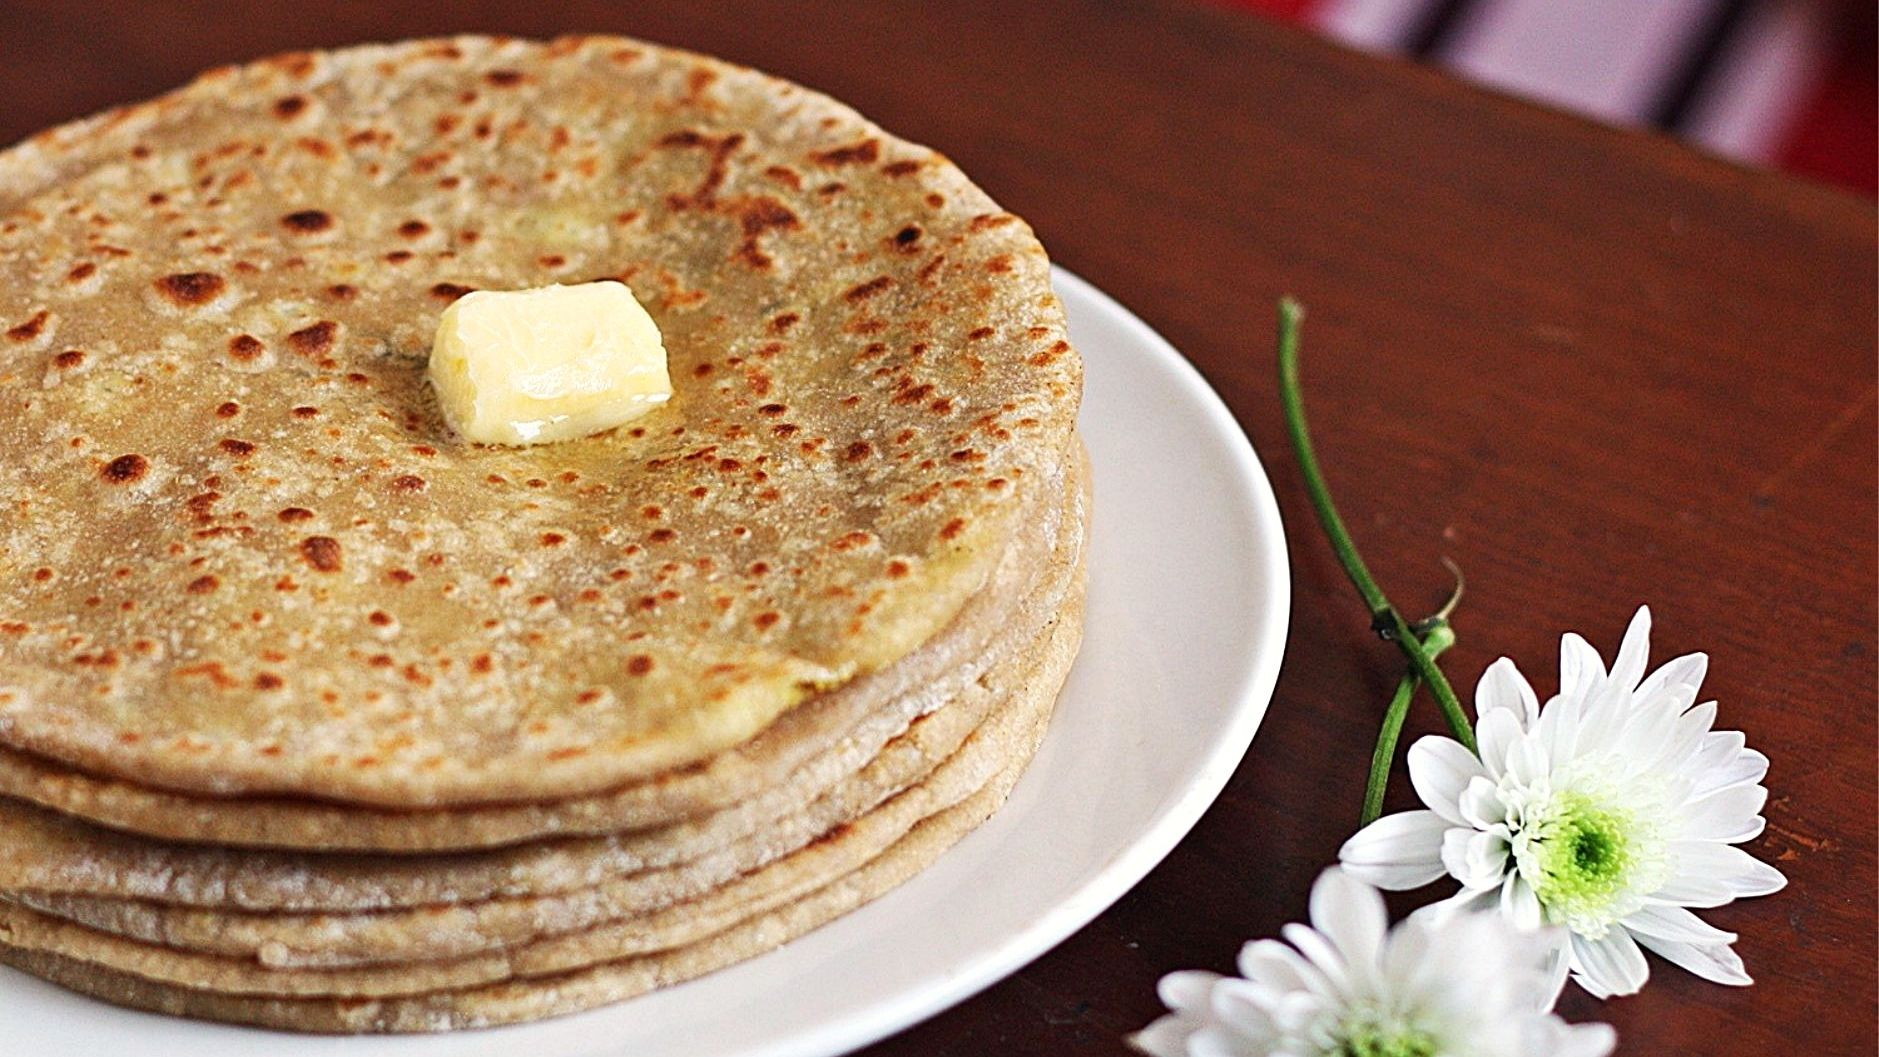 Aaloo (Potato) Paratha Recipe